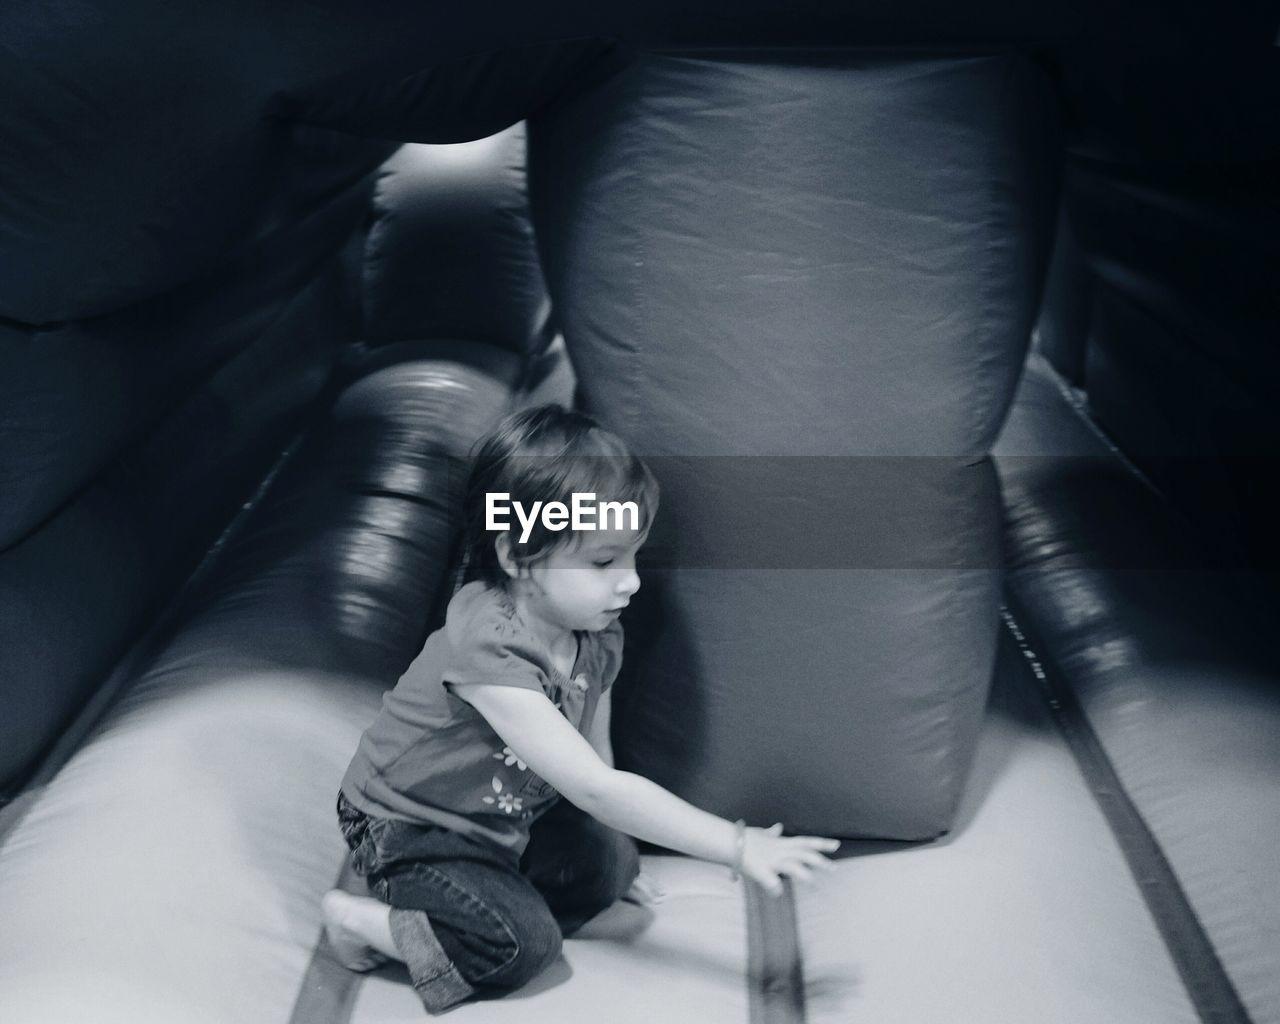 Side view of girl plying in bouncy castle